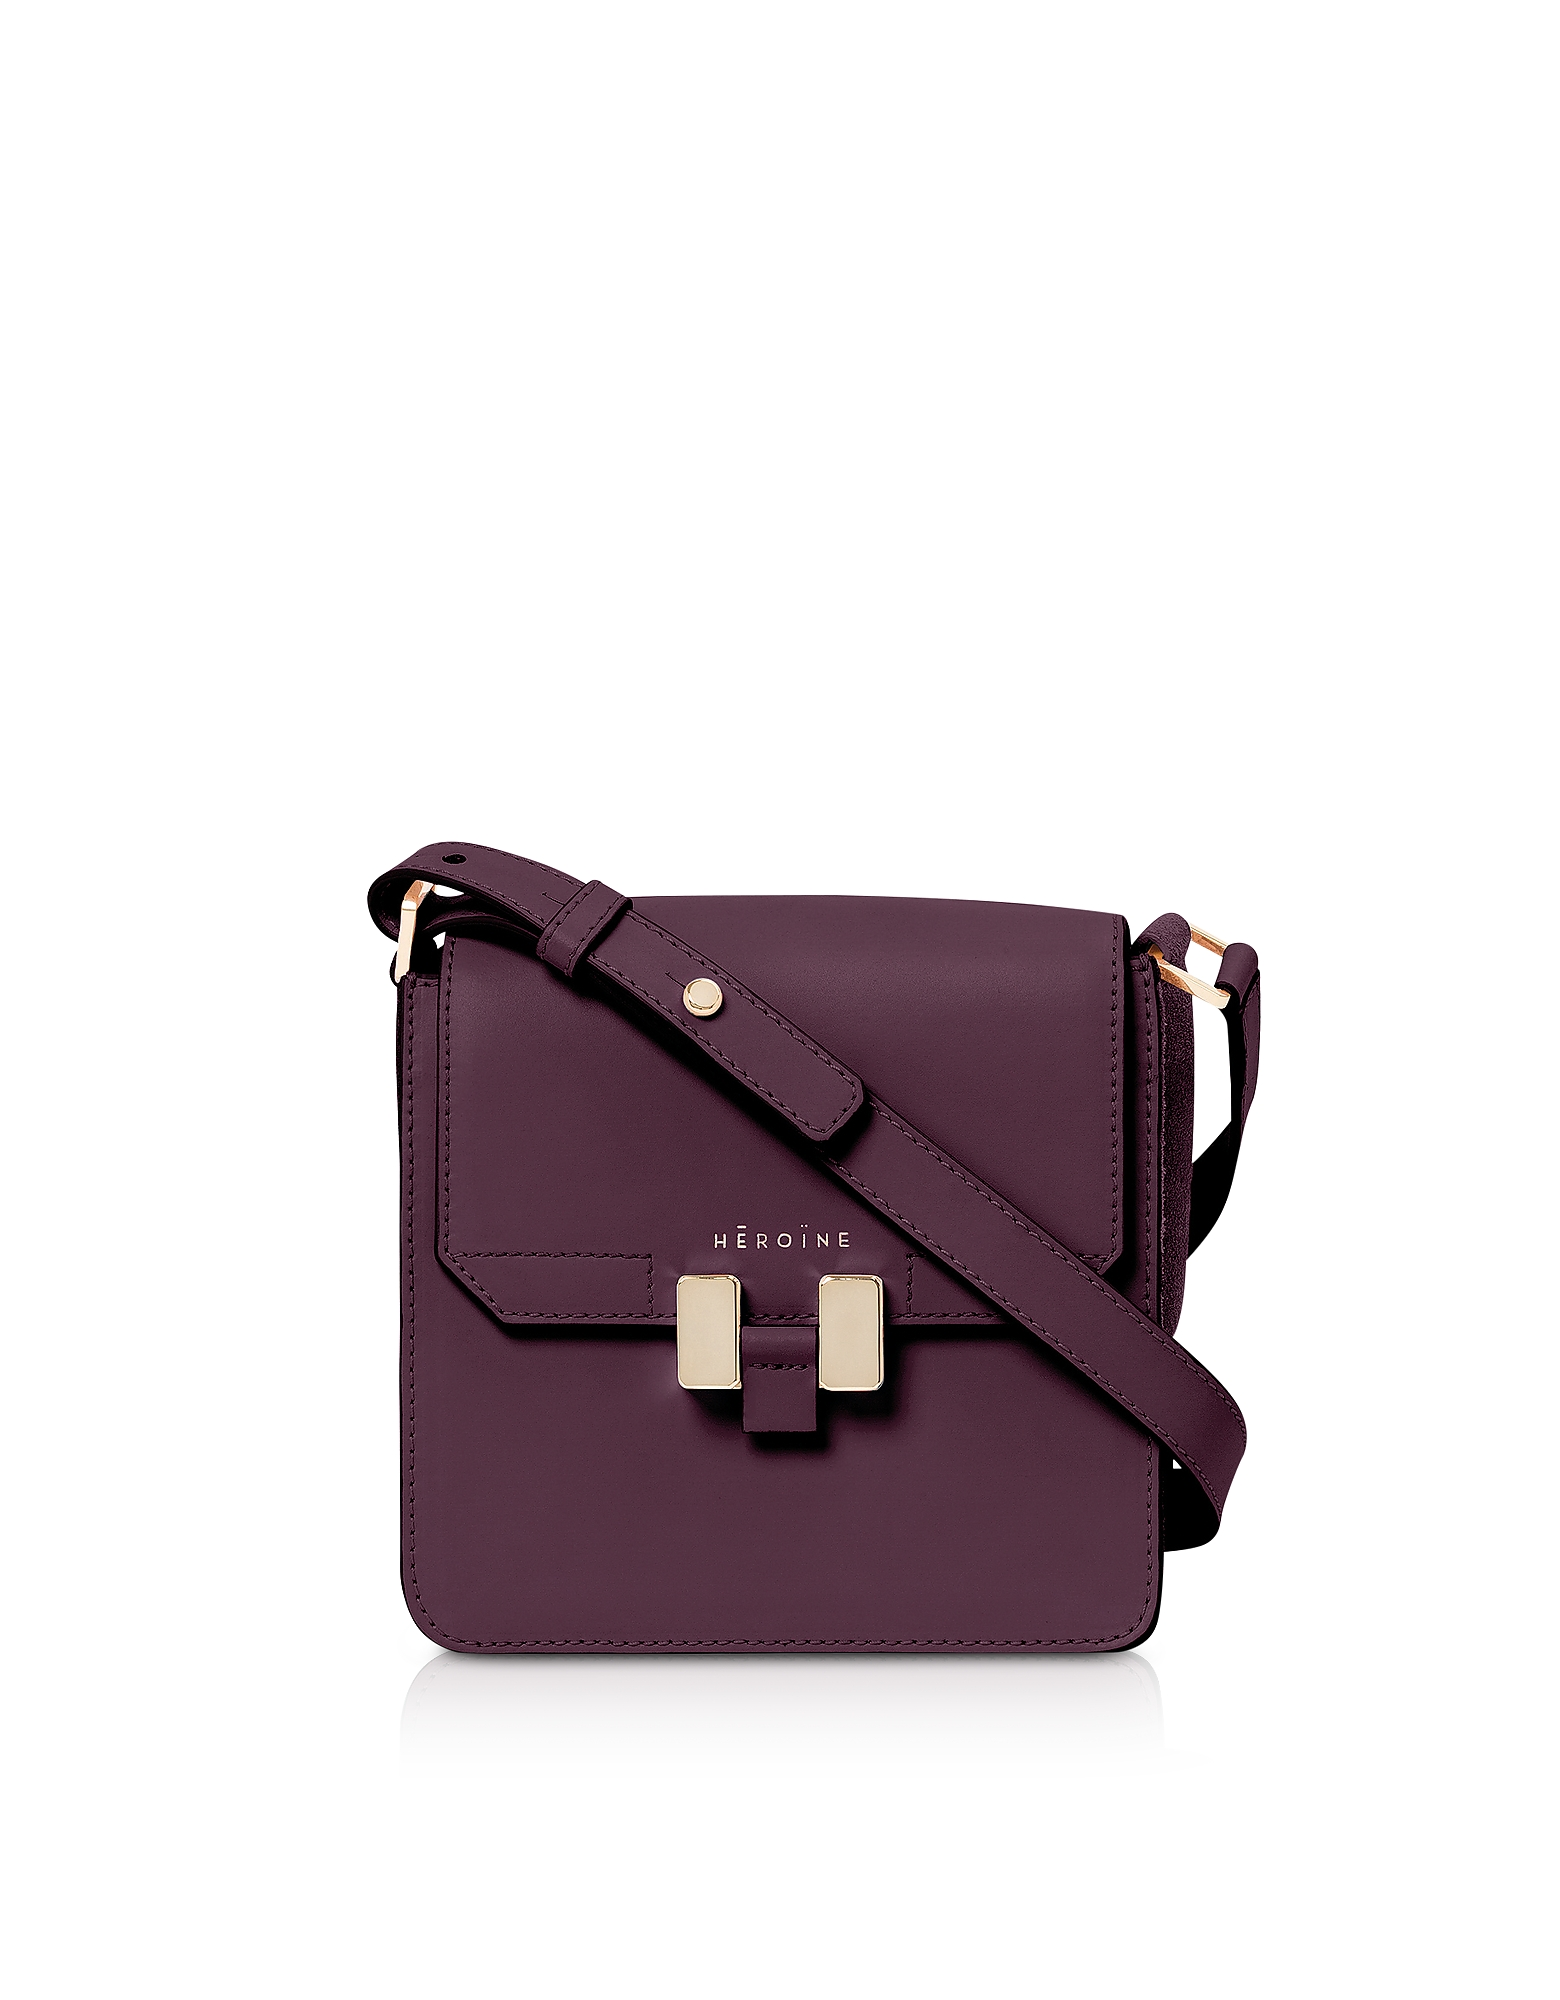 Maison Heroine Designer Handbags, Berry Leather Tilda Phone Mini Bag